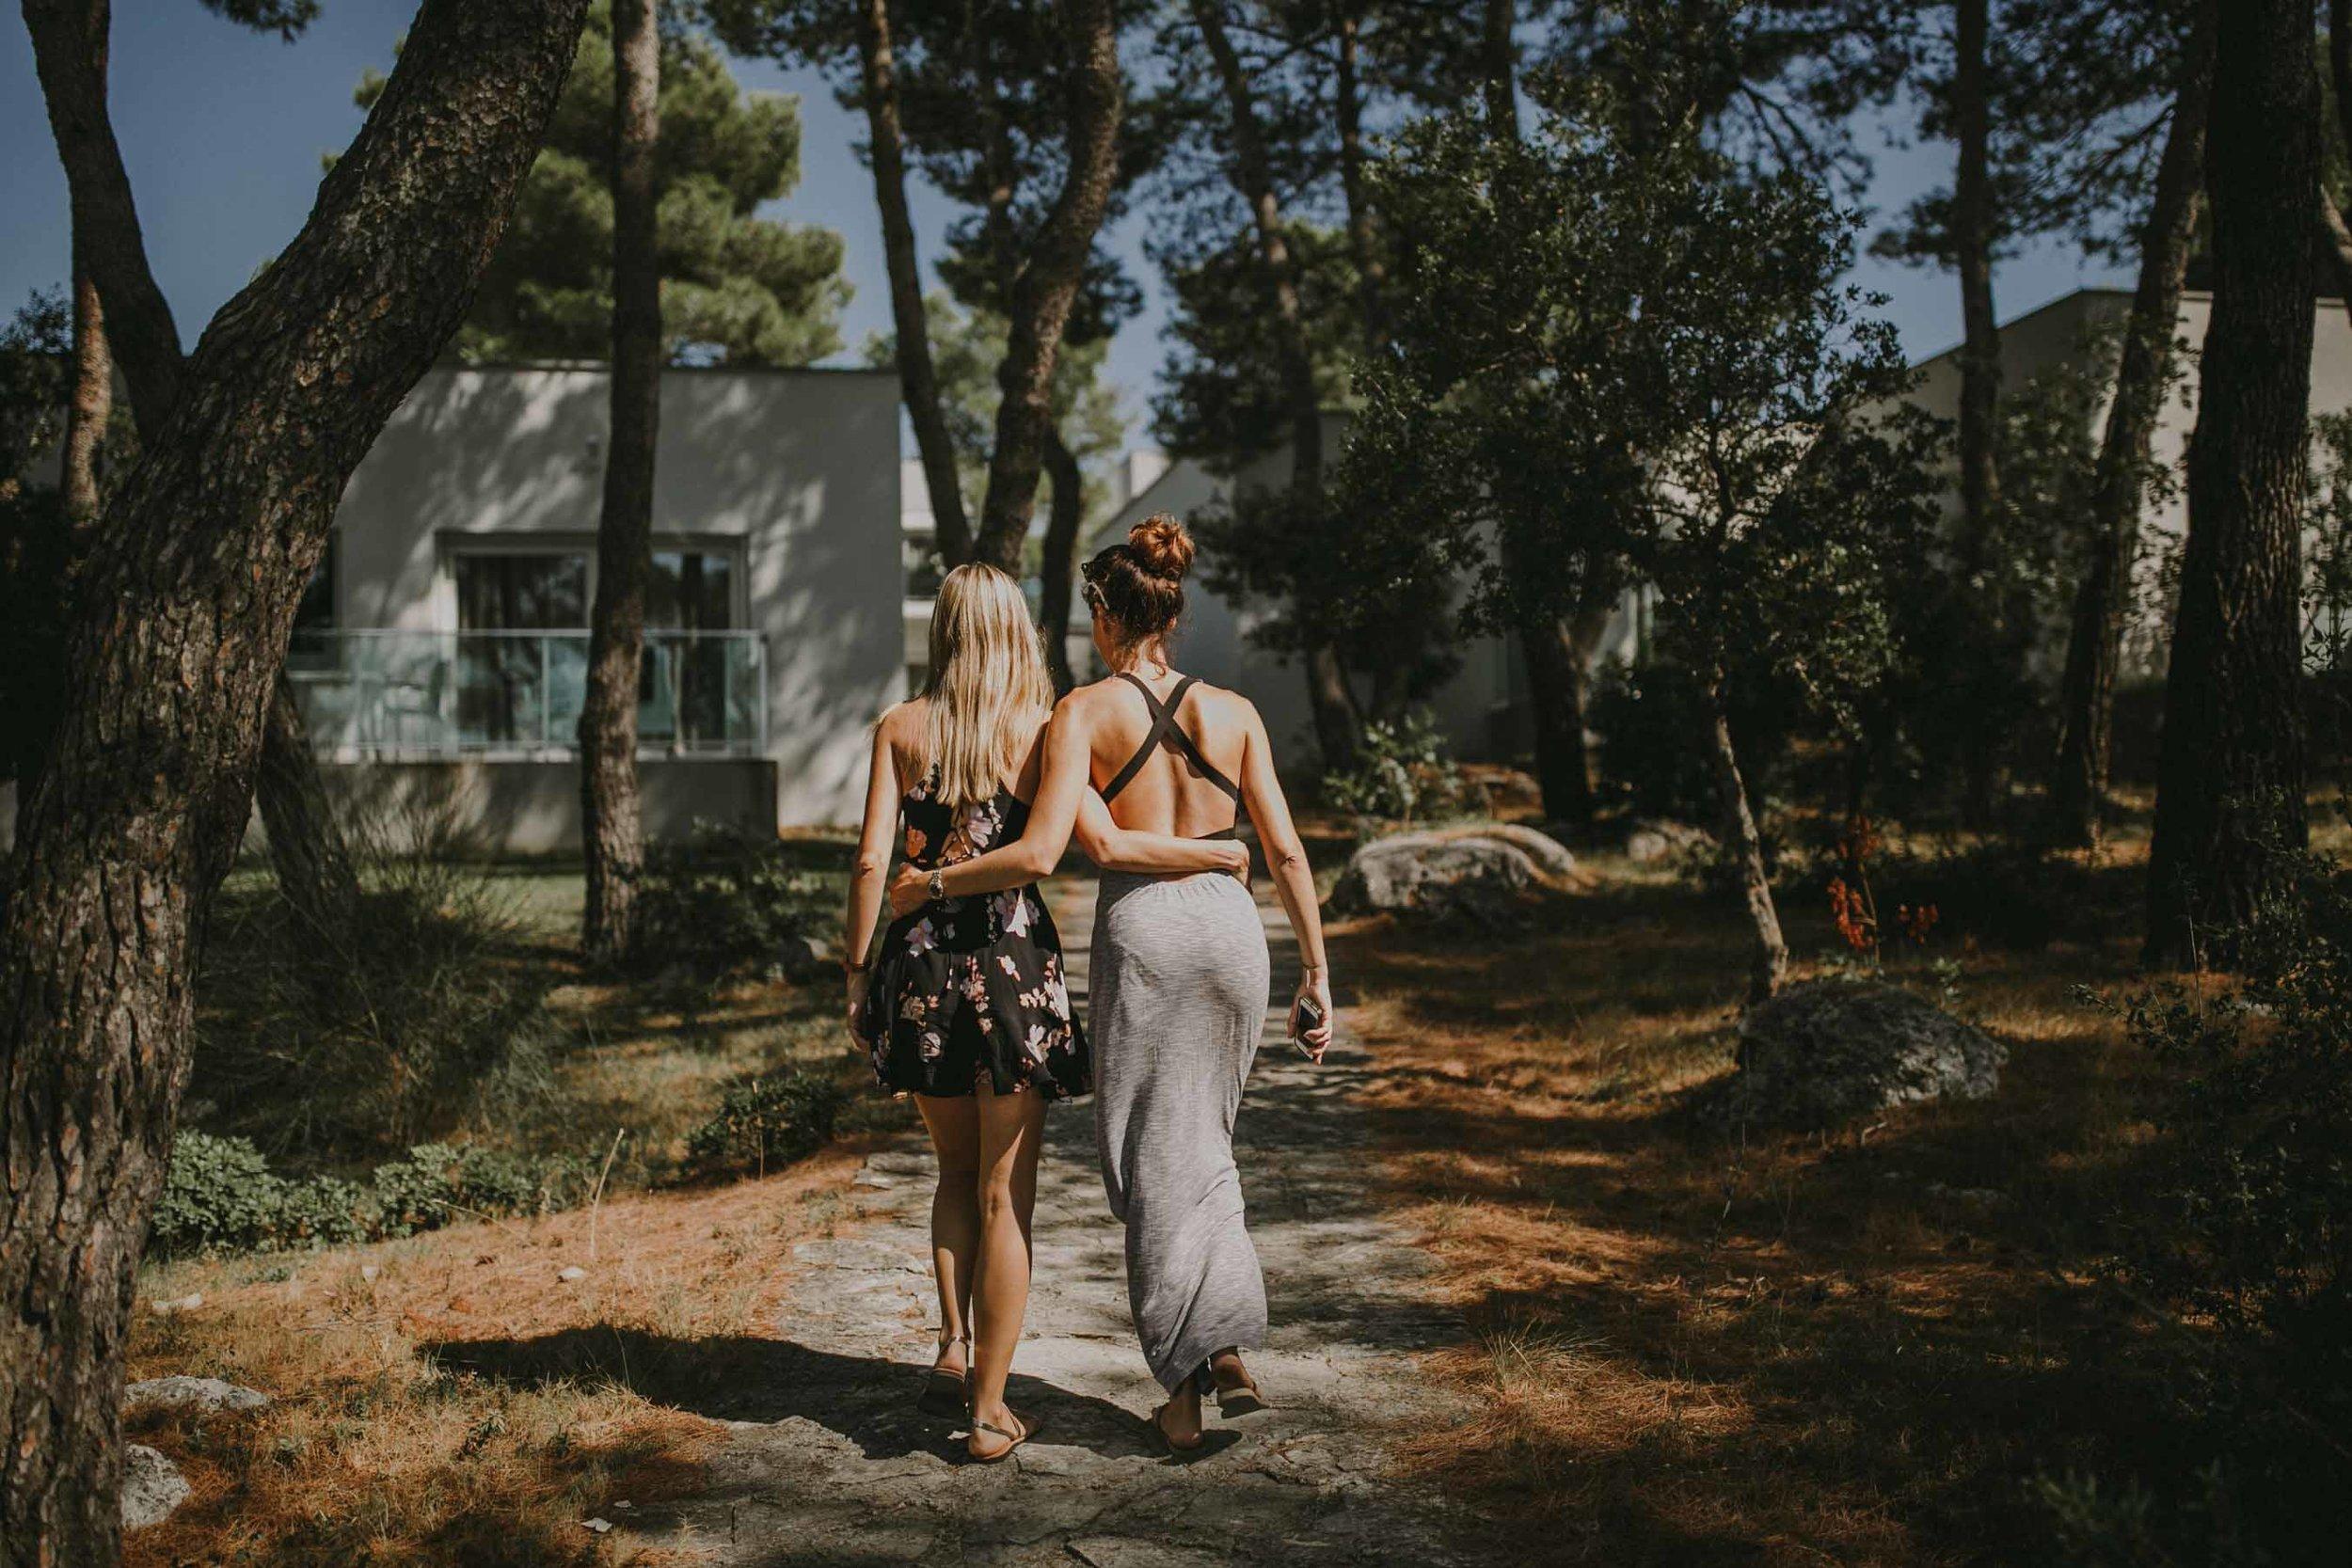 sylvia&dimitri-Wedding-Crvena_Luka-Croatia-6(7081).jpg